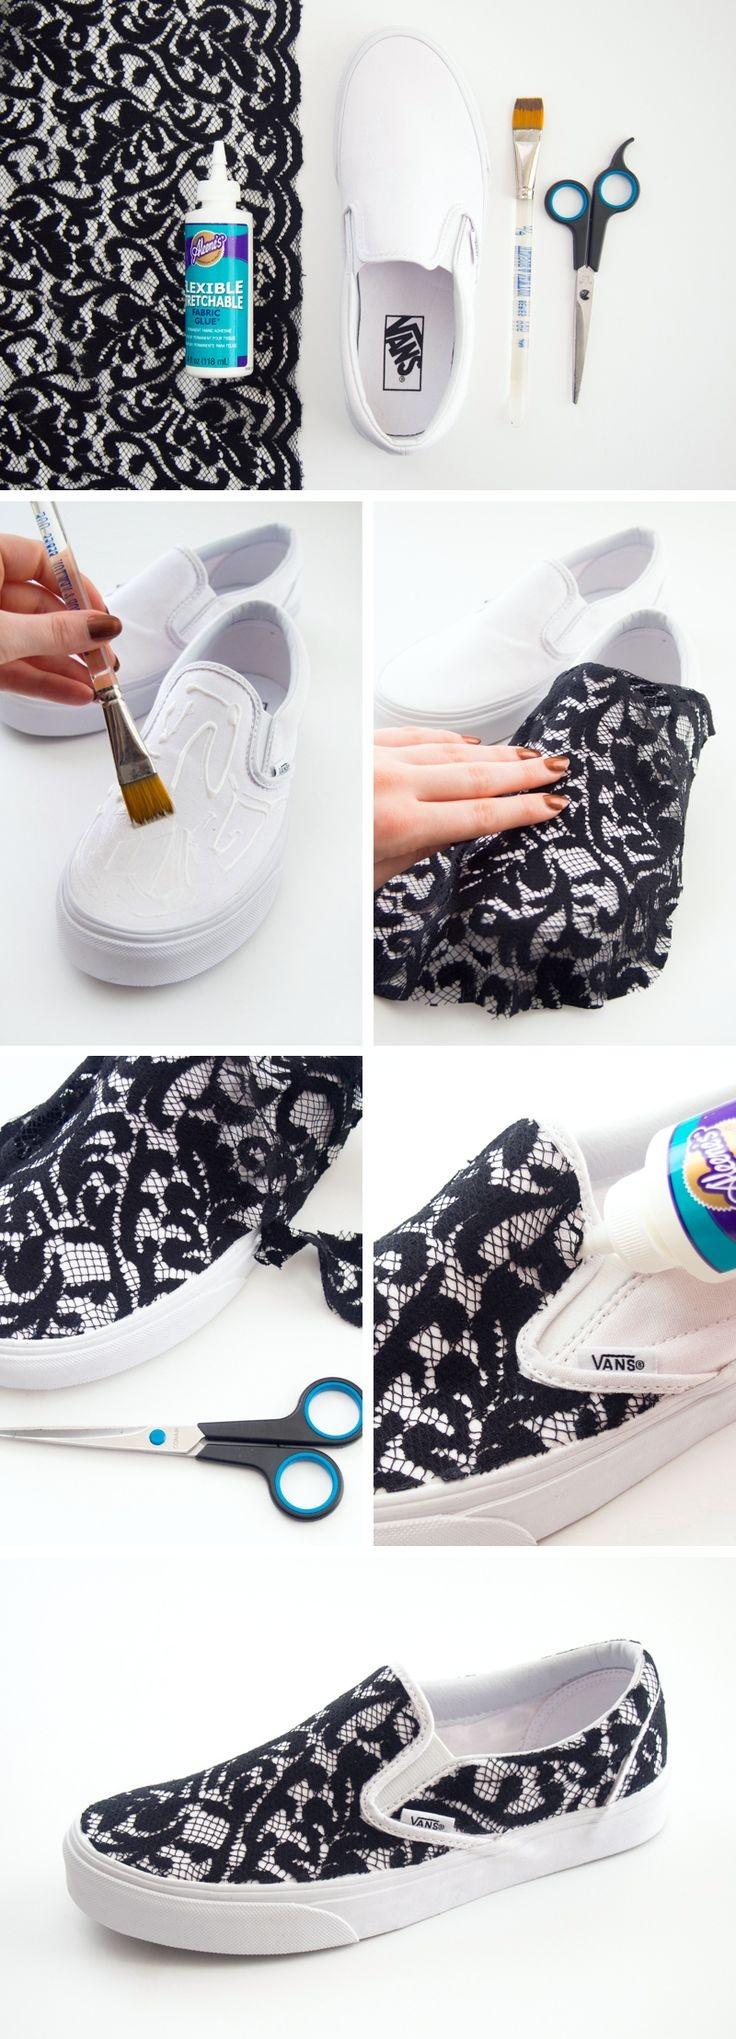 kako obnoviti cipele